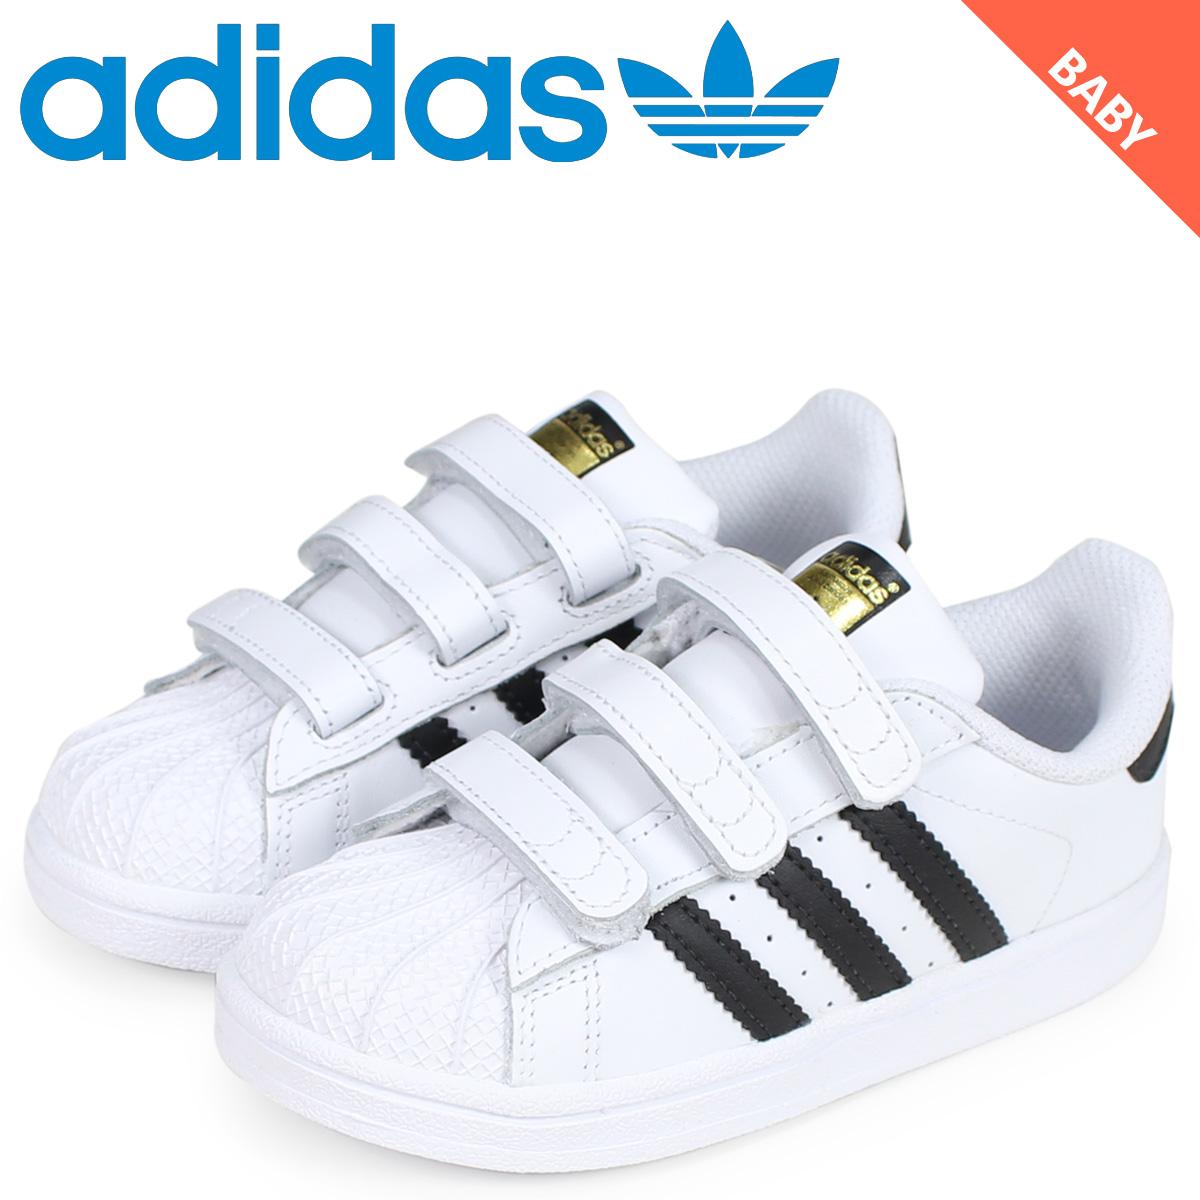 new style c7989 e91ad adidas Originals Adidas originals superstar sneakers Baby Bell black  SUPERSTAR CF I white white BZ0418